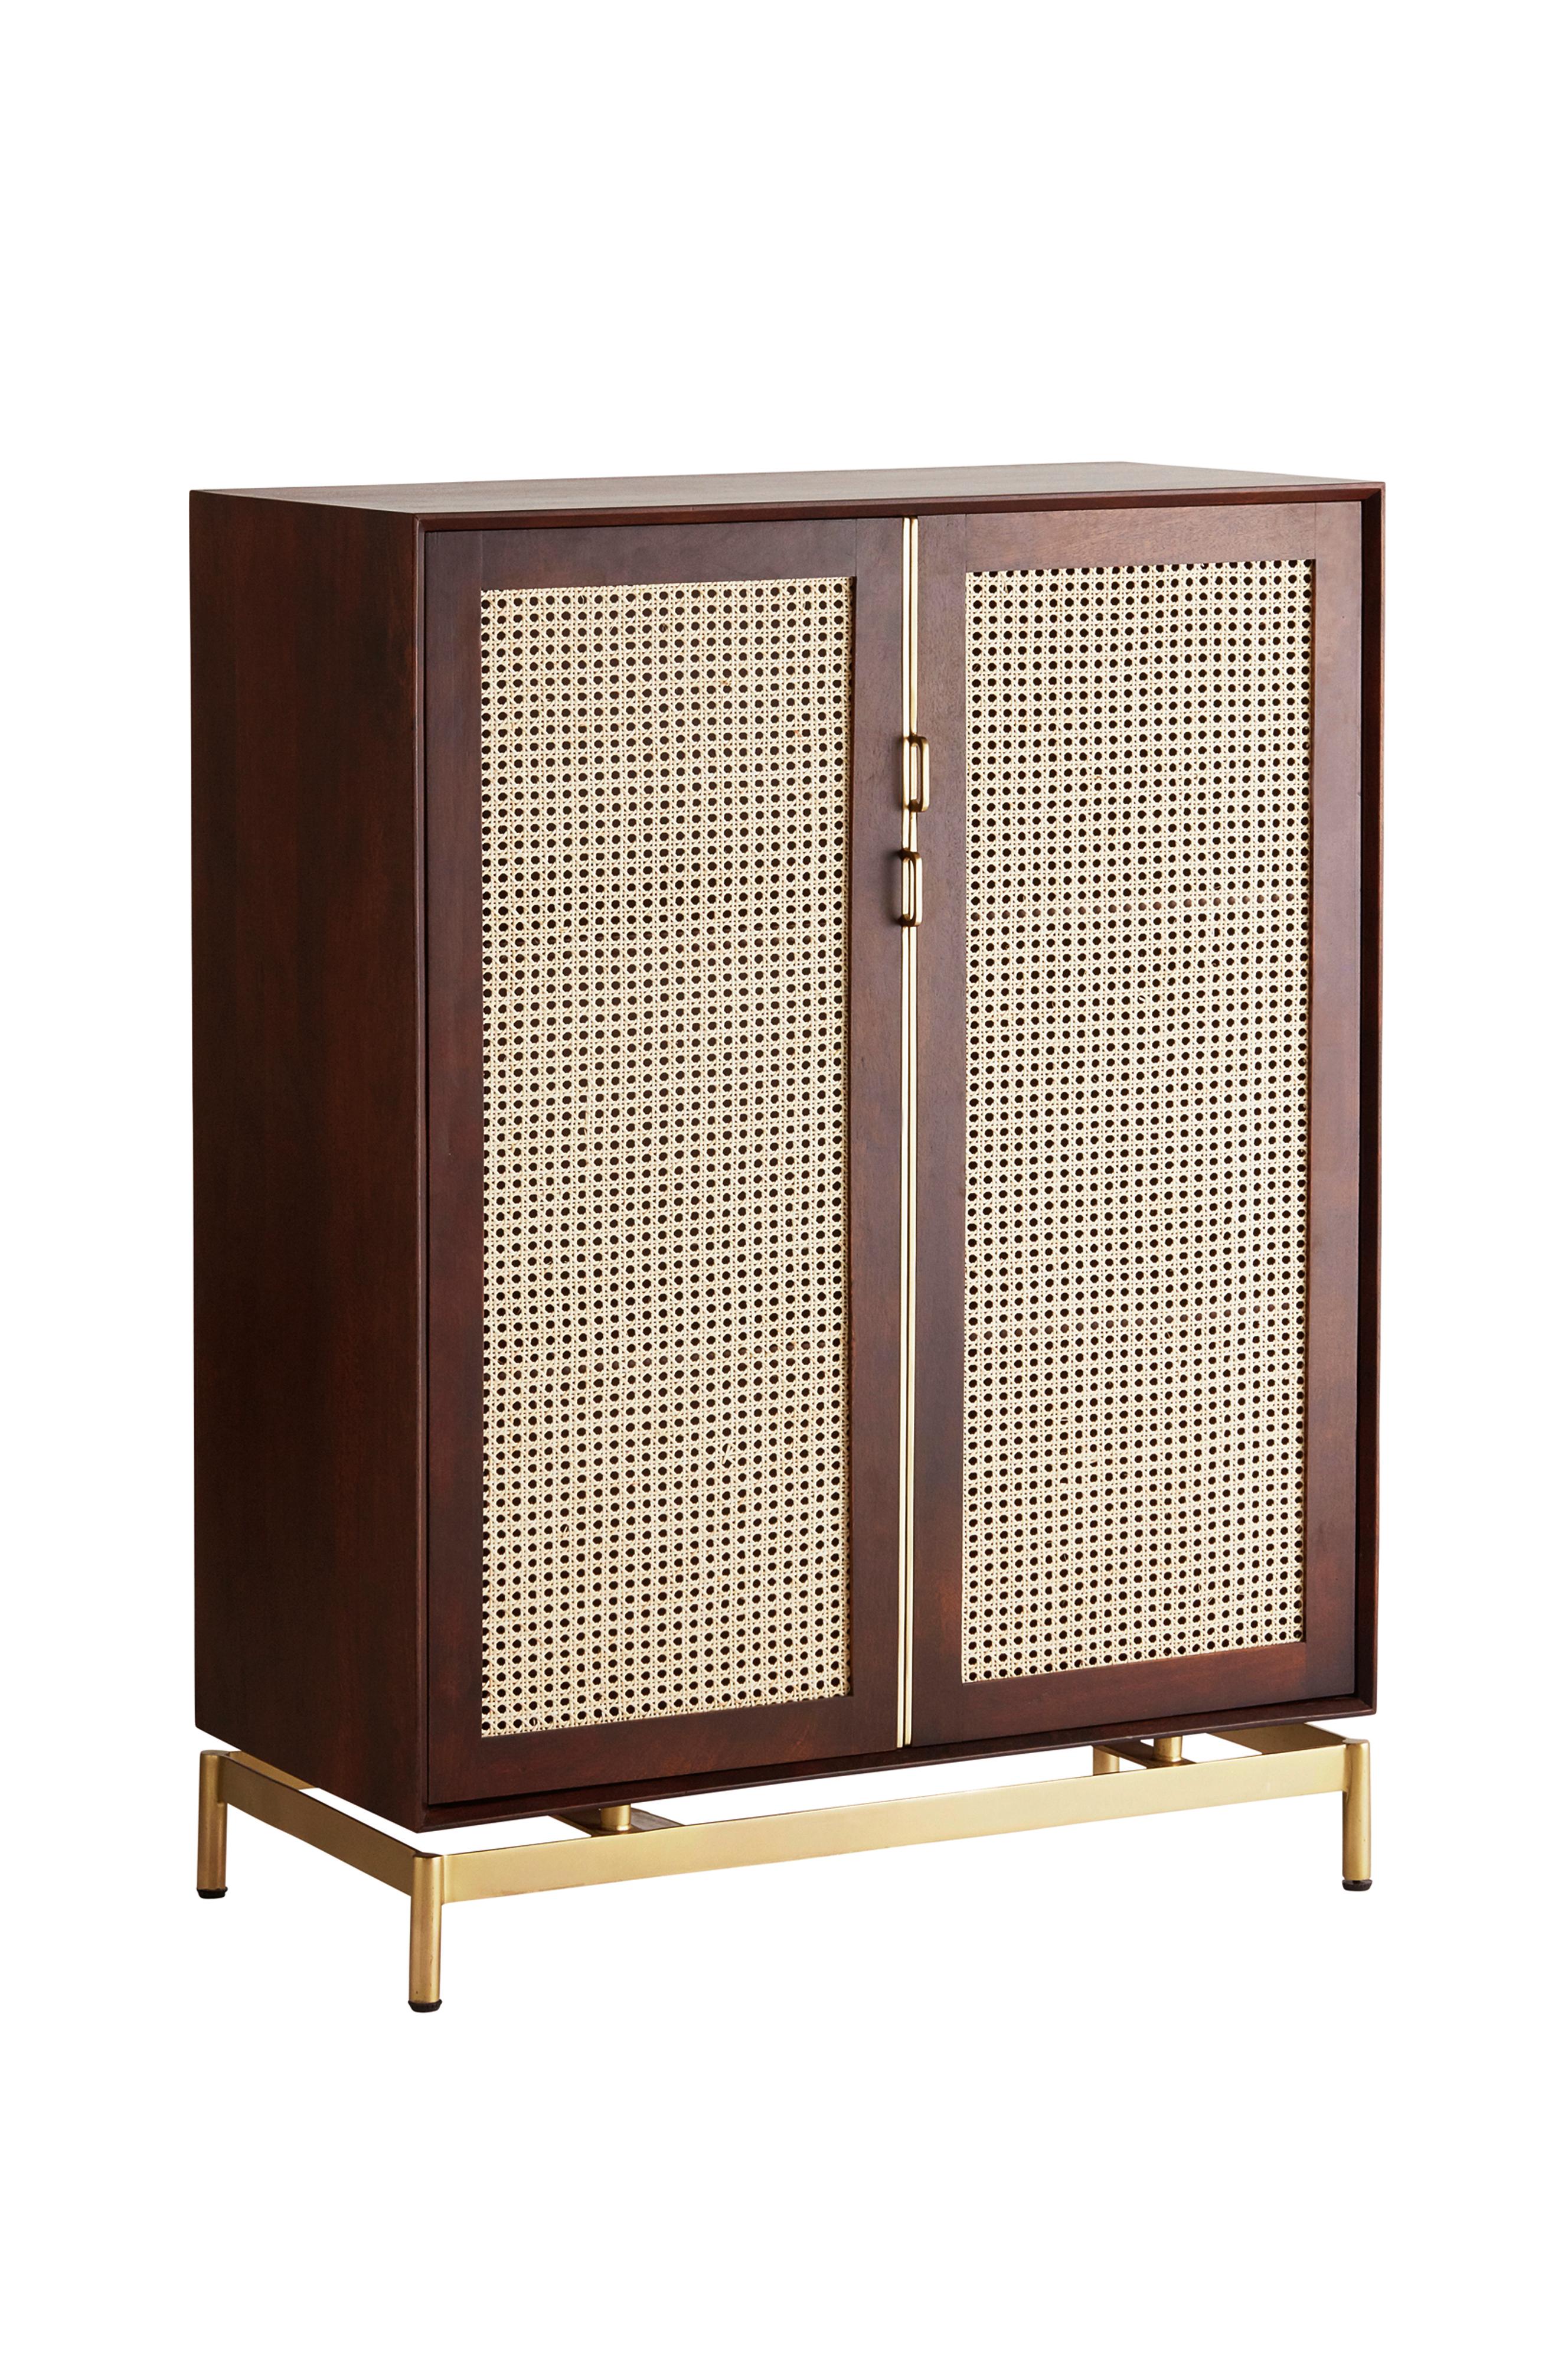 Stor LOUISIANA skap   Stue   Cabinet, Credenza og Furniture SI-94